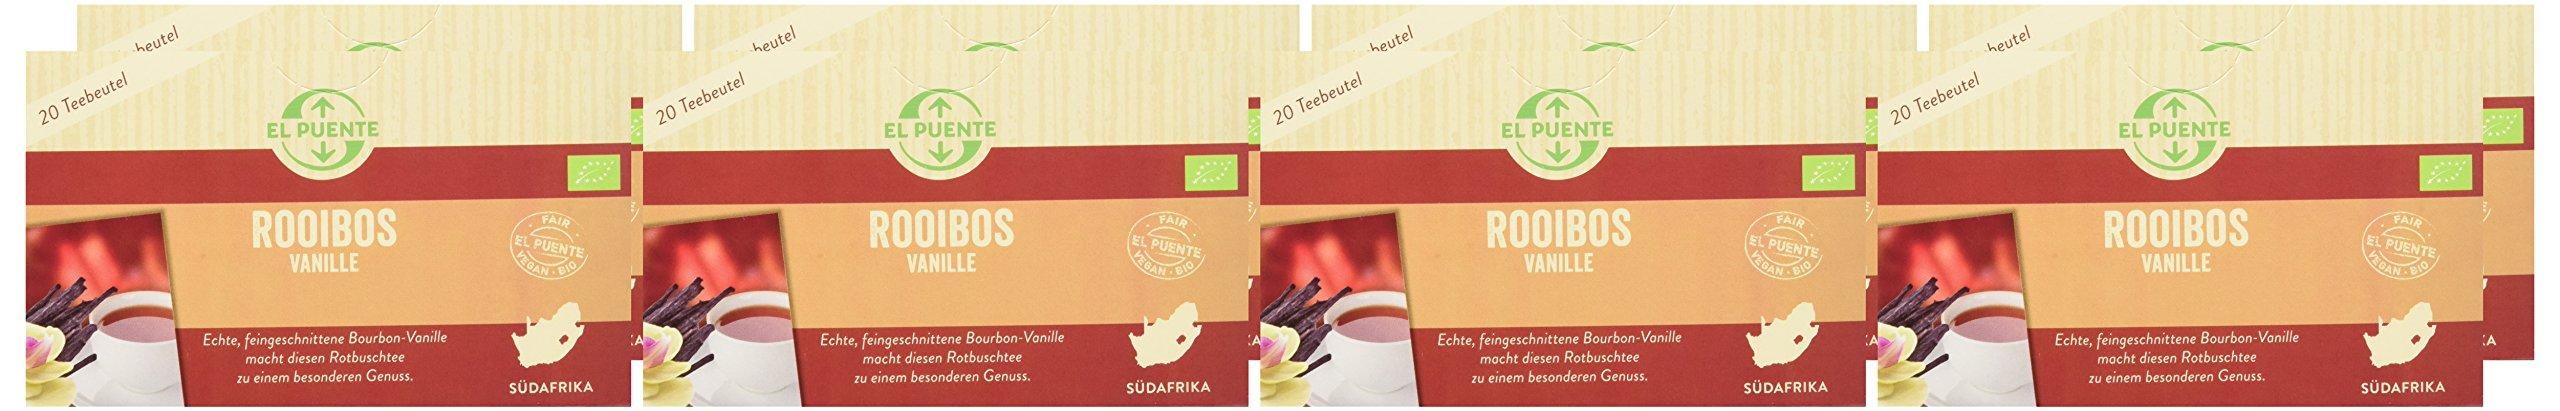 El-Puente-Rotbusch-Vanille-20-Teebeutel-kuvertiert-8er-Pack-8-x-36-g